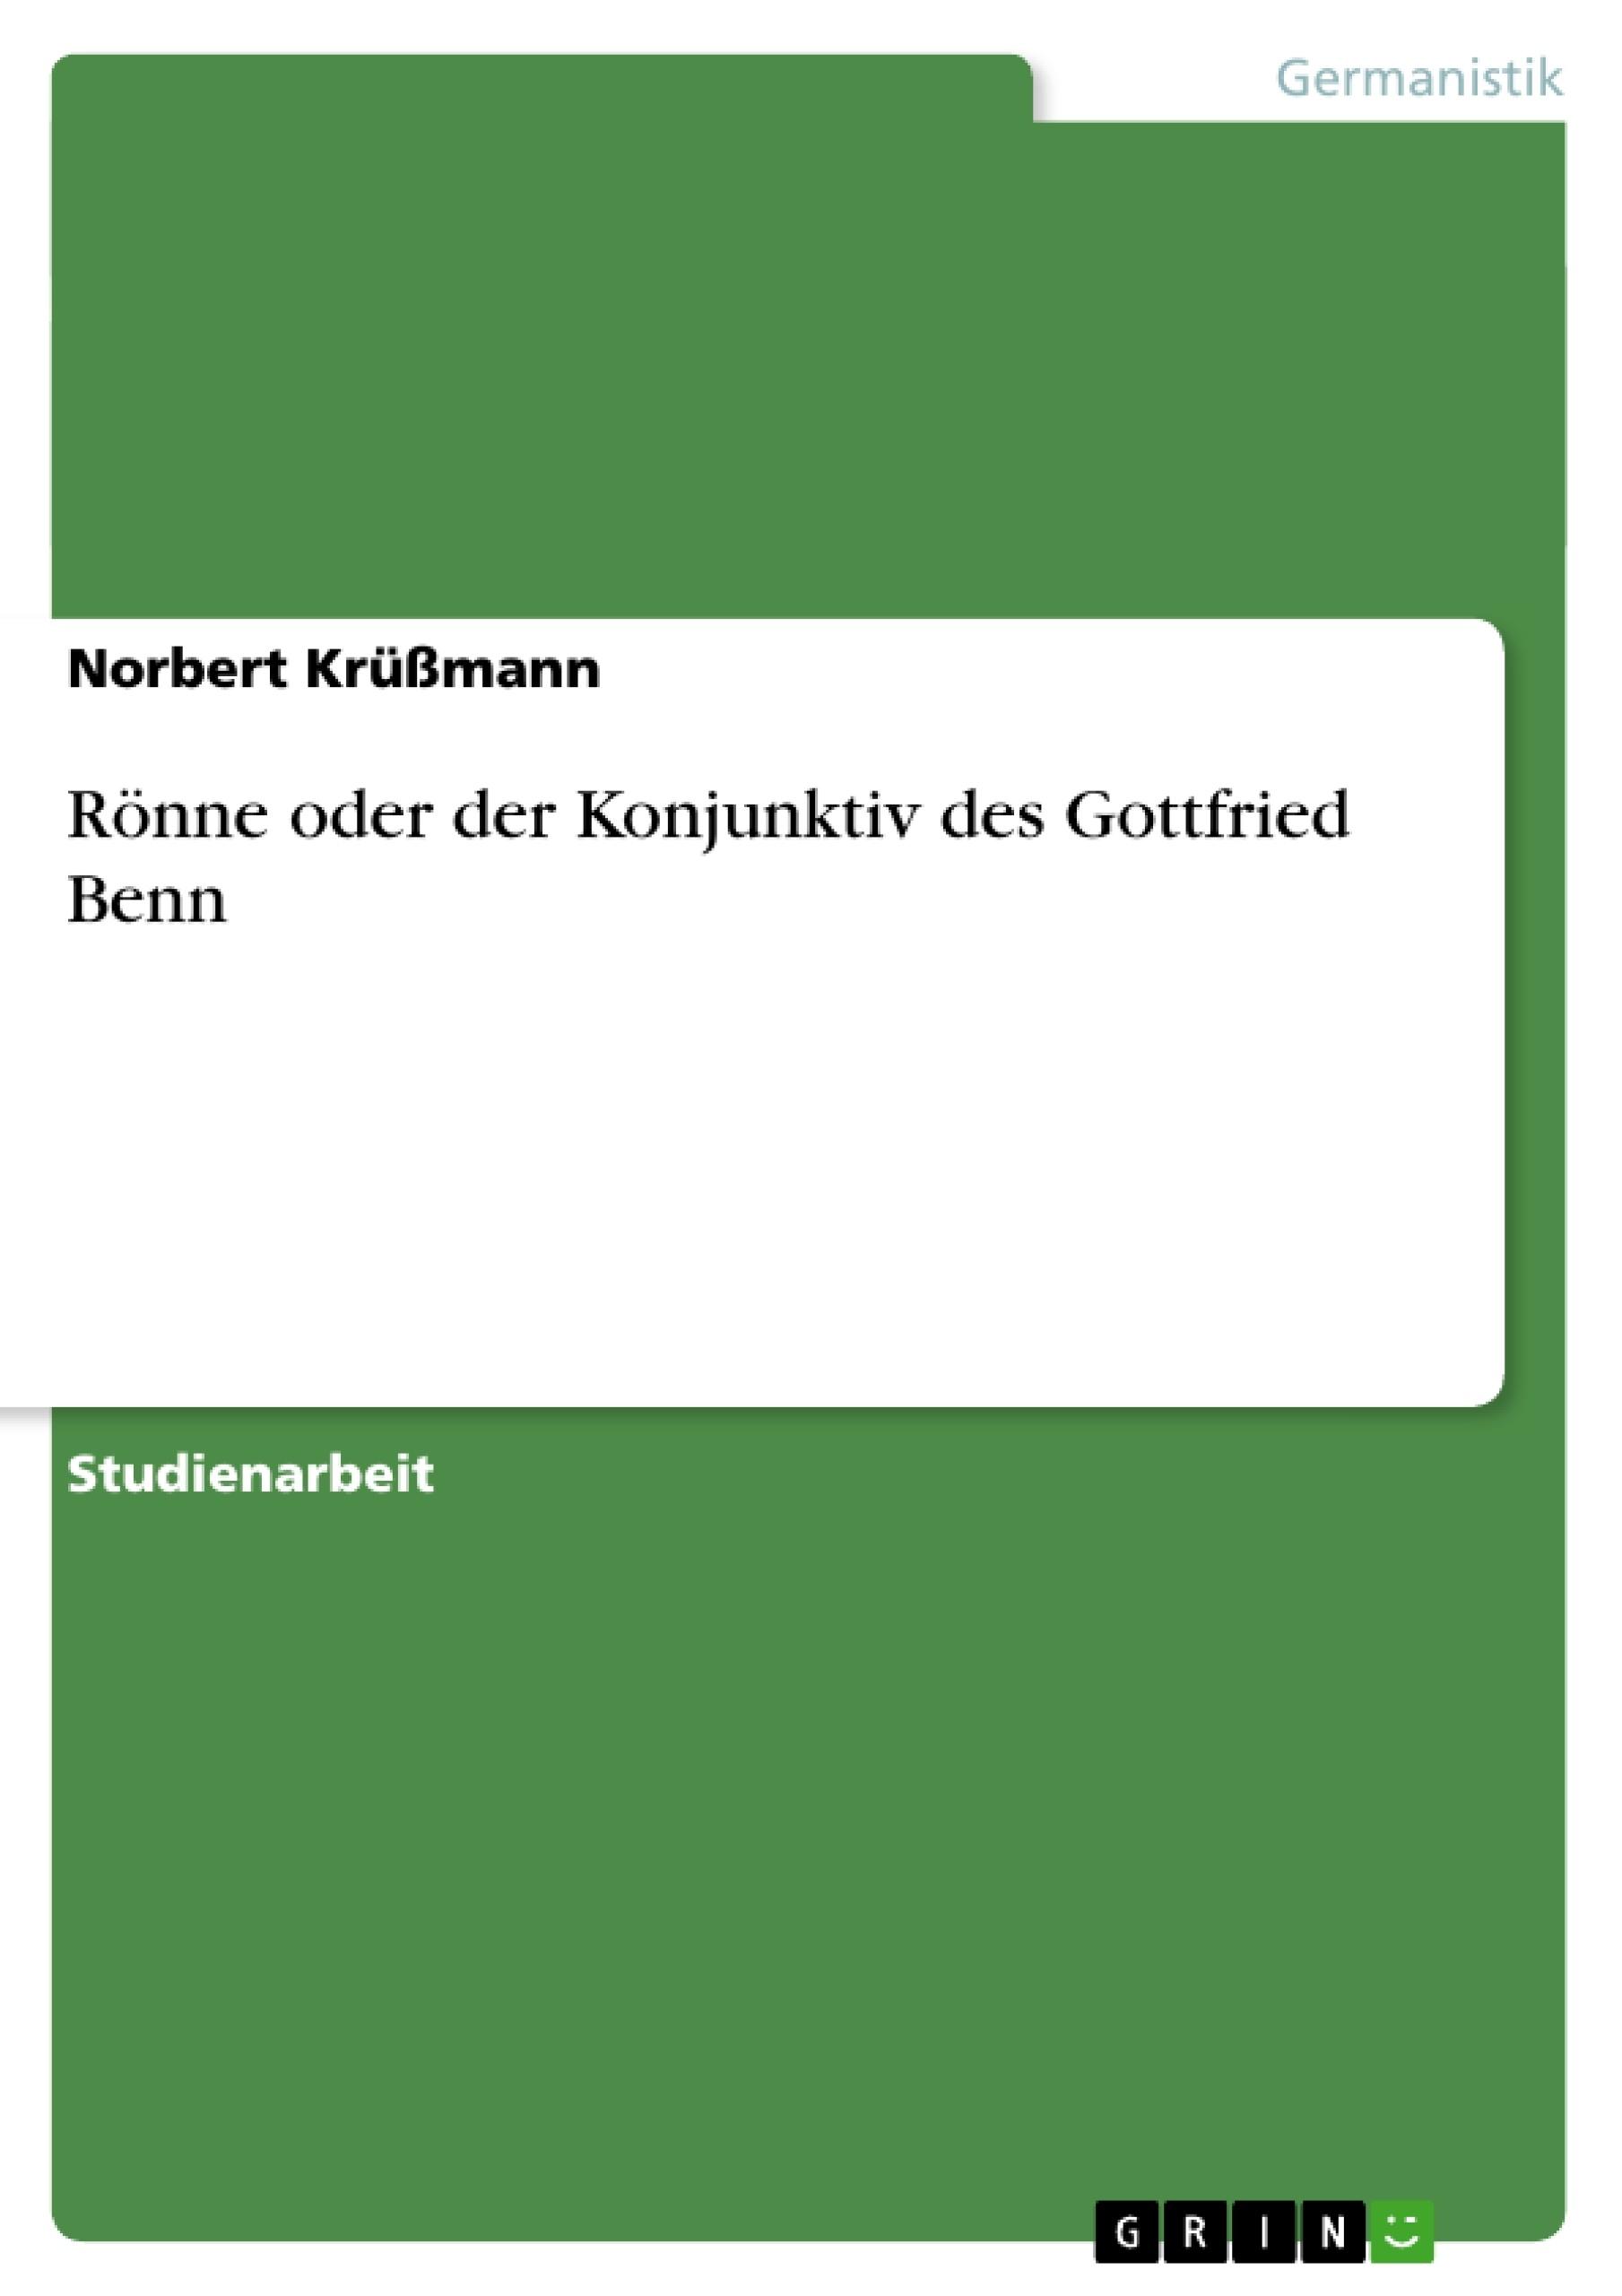 Titel: Rönne oder der Konjunktiv des Gottfried Benn